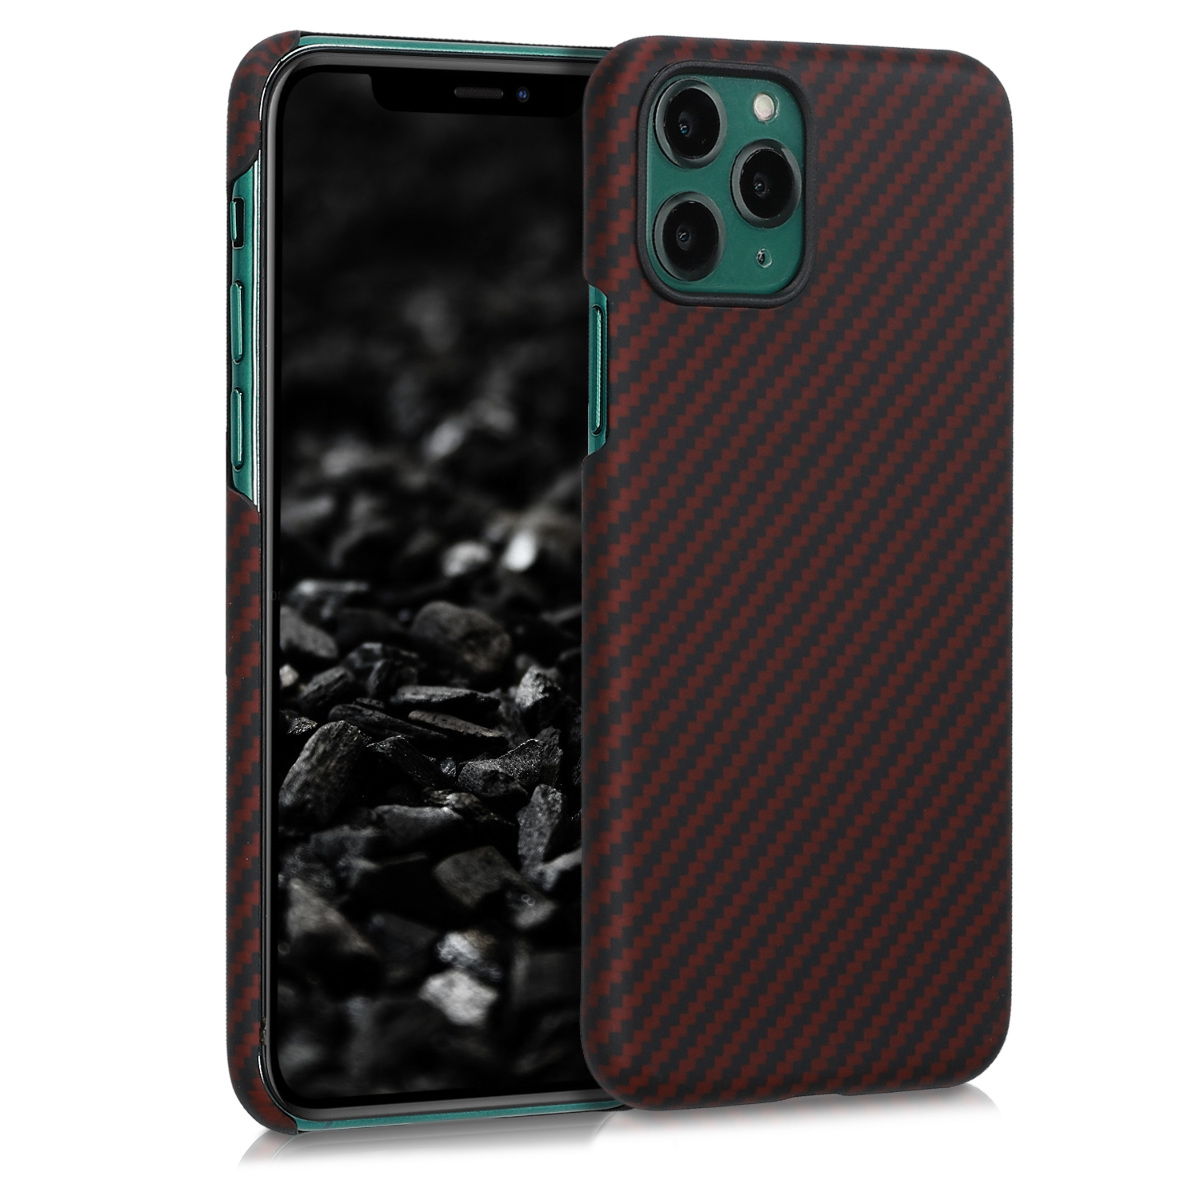 Aramidpouzdro pro Apple iPhone 11 Pro - Red Matte | Black